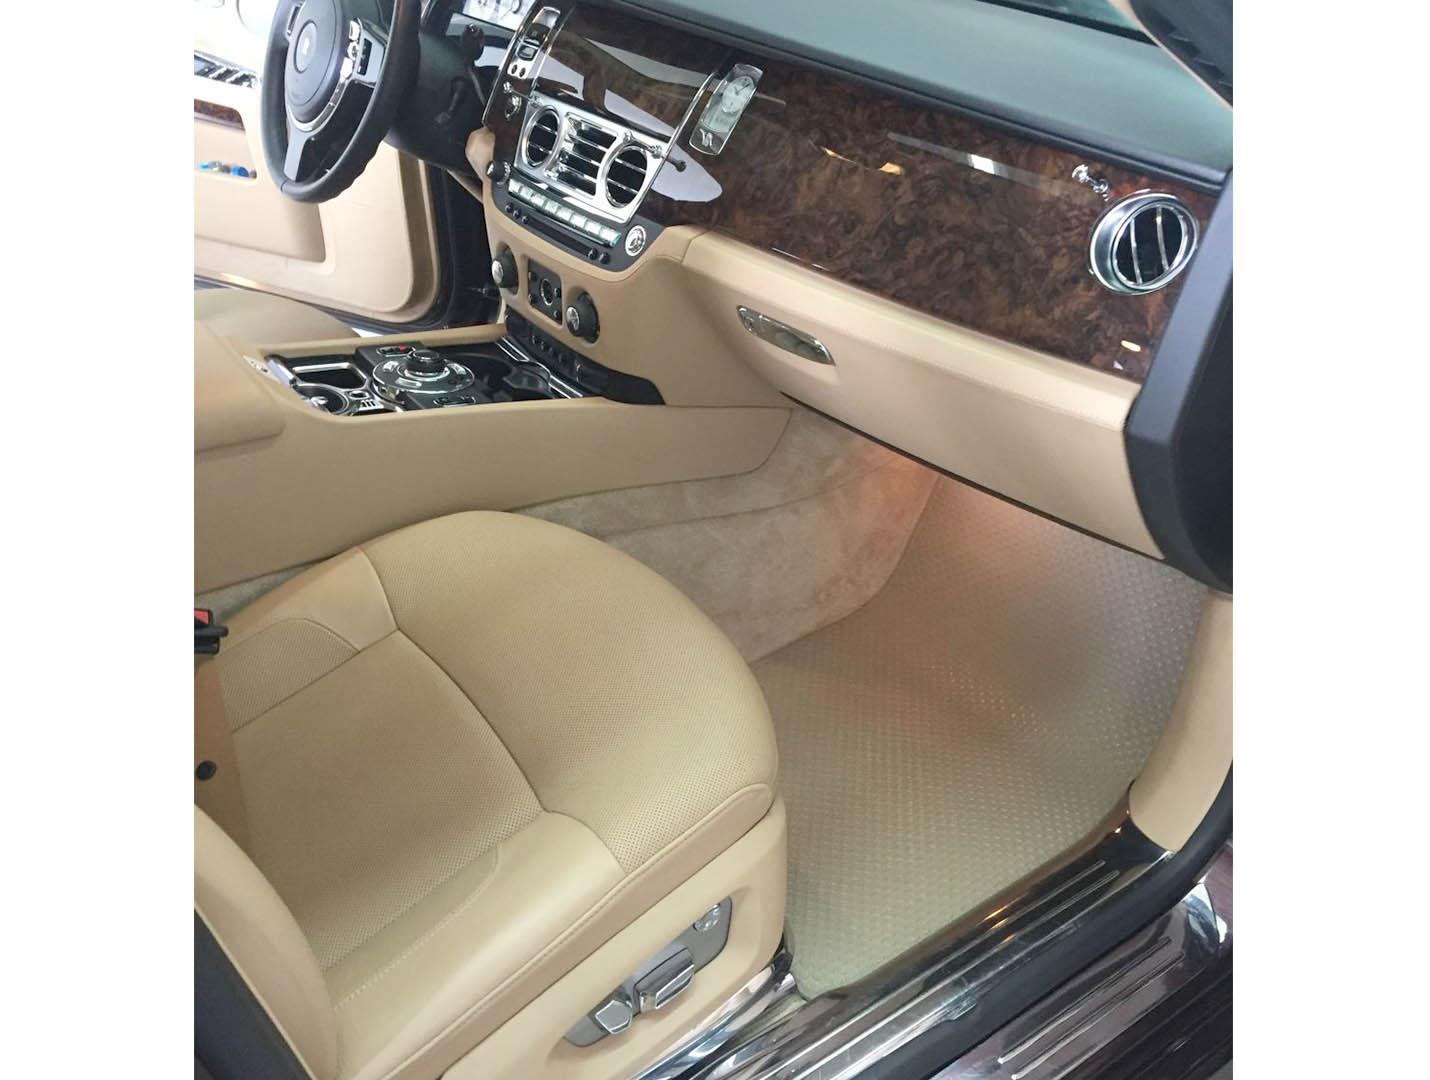 Thảm lót sàn Rolls Royce Ghost